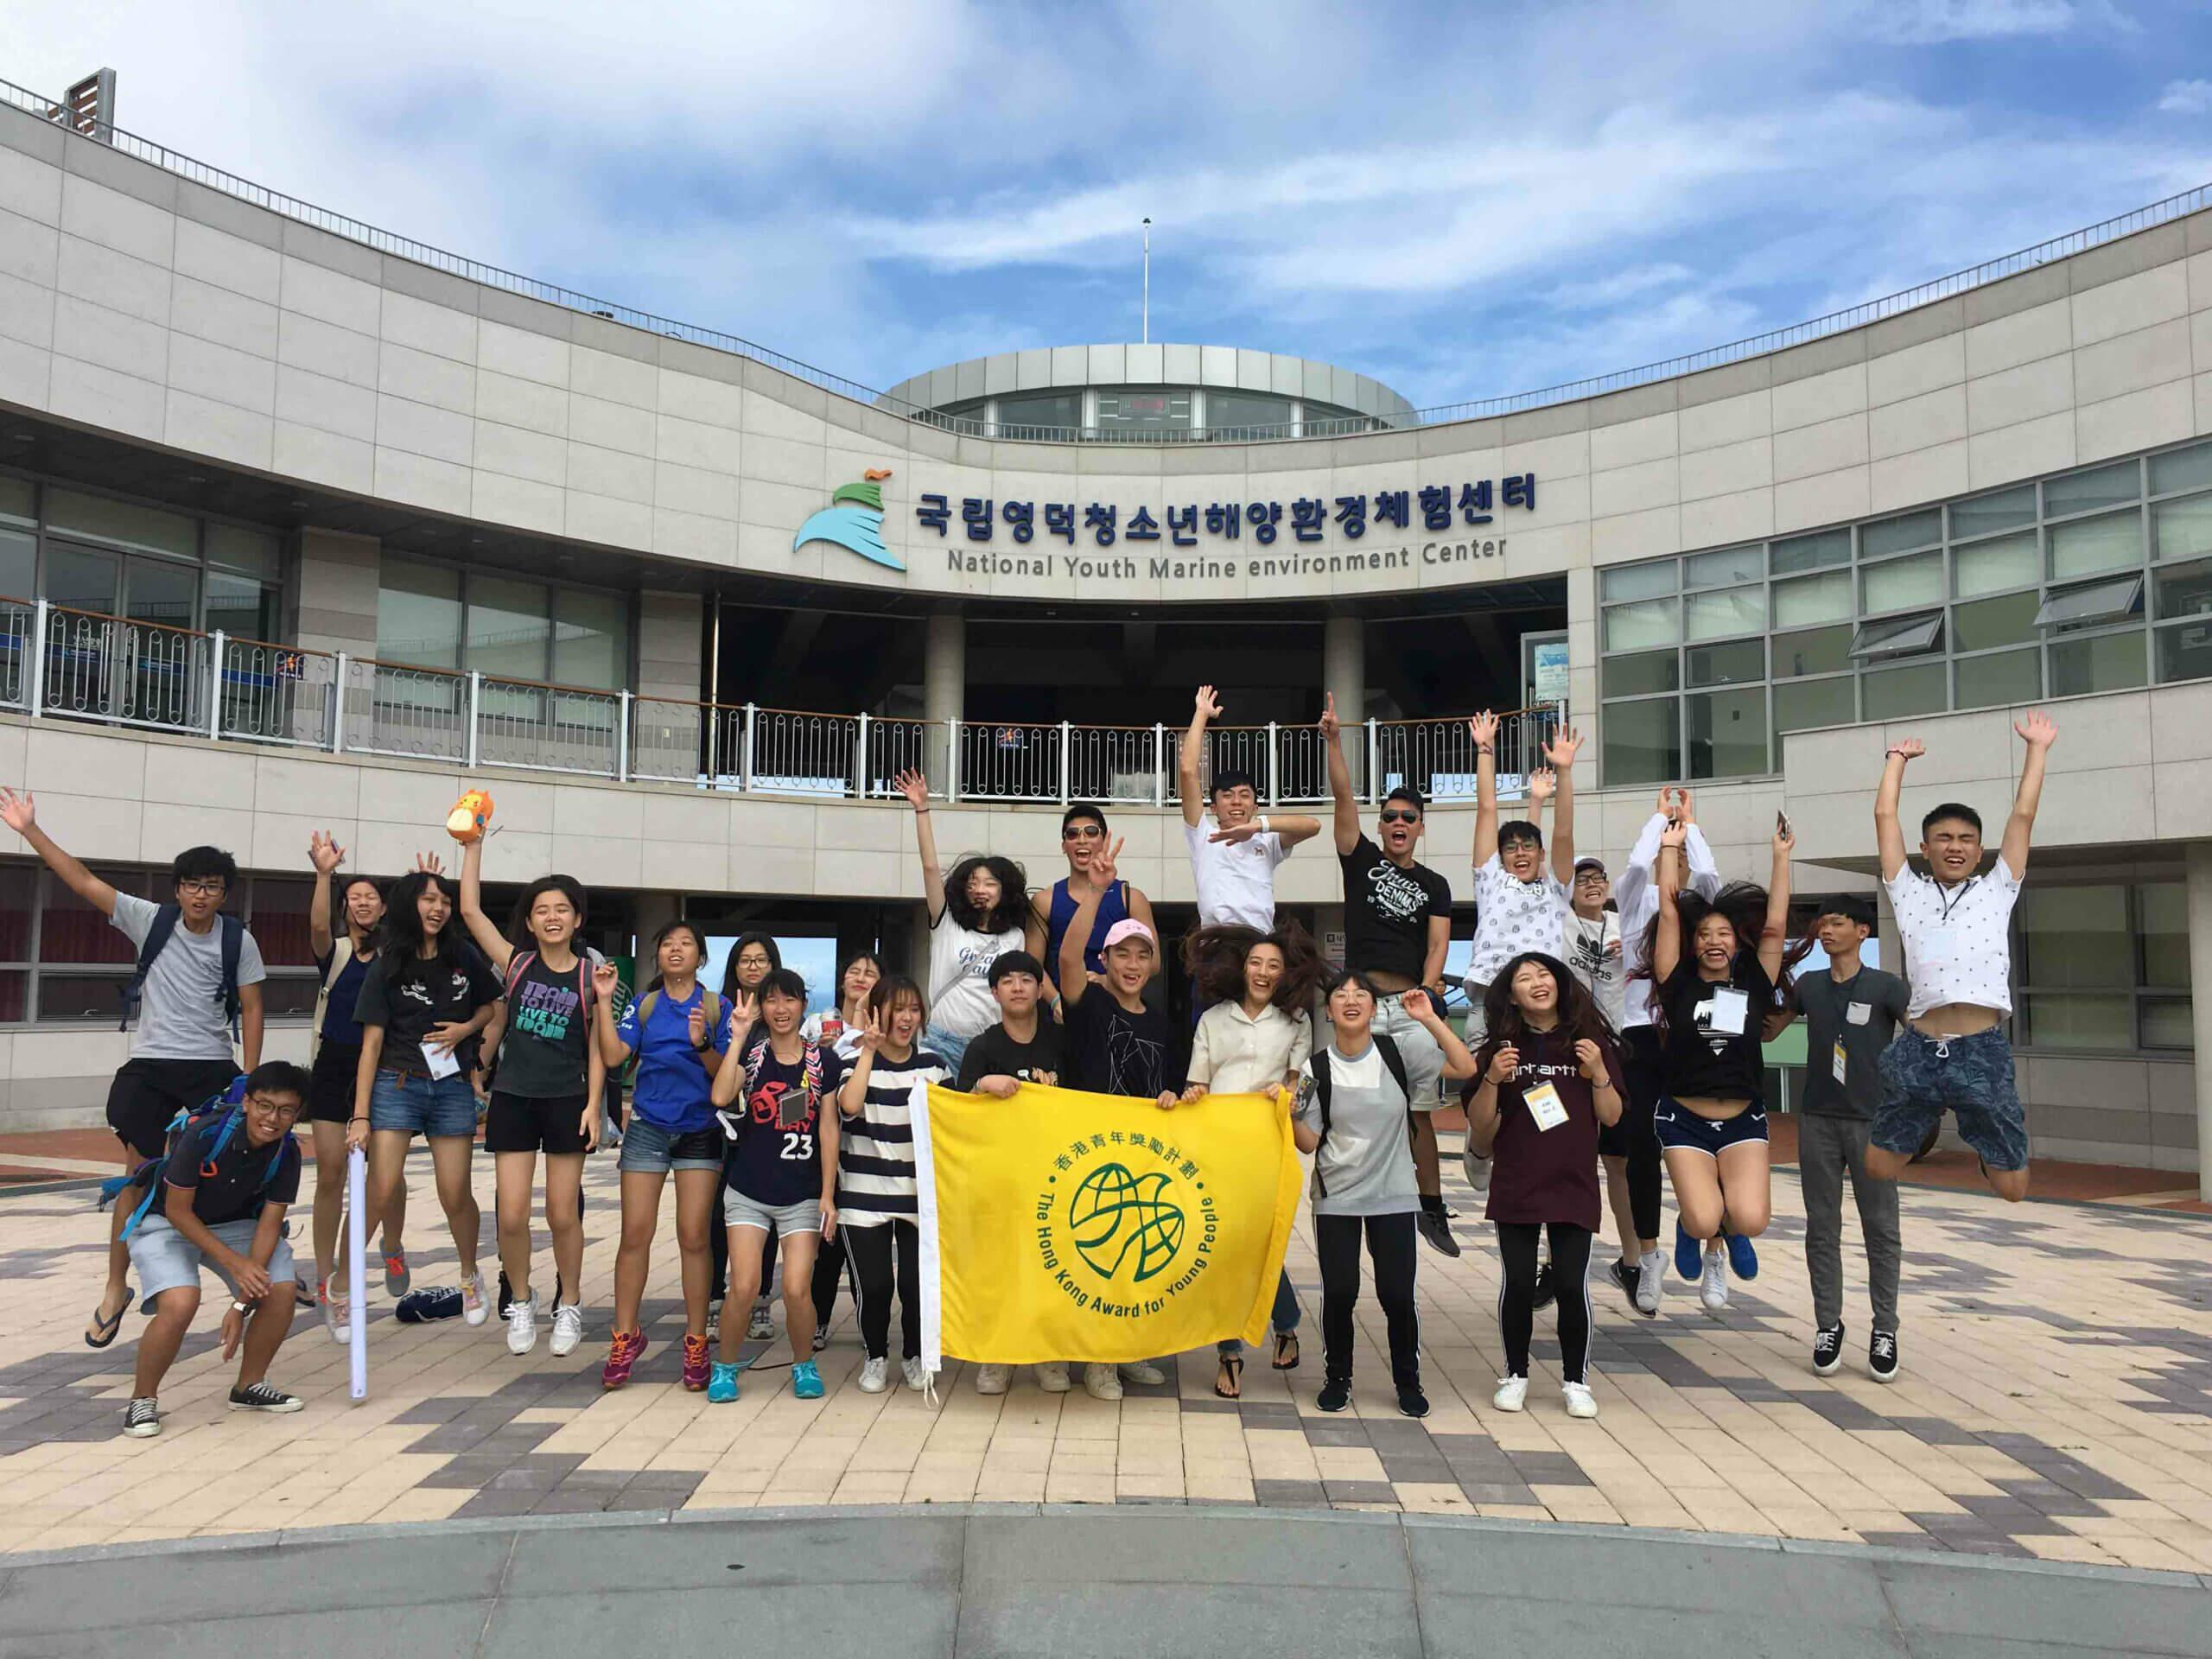 SmarTone AYP 香港 – 韓國文化交流計劃2017 (15-21/08/2017)